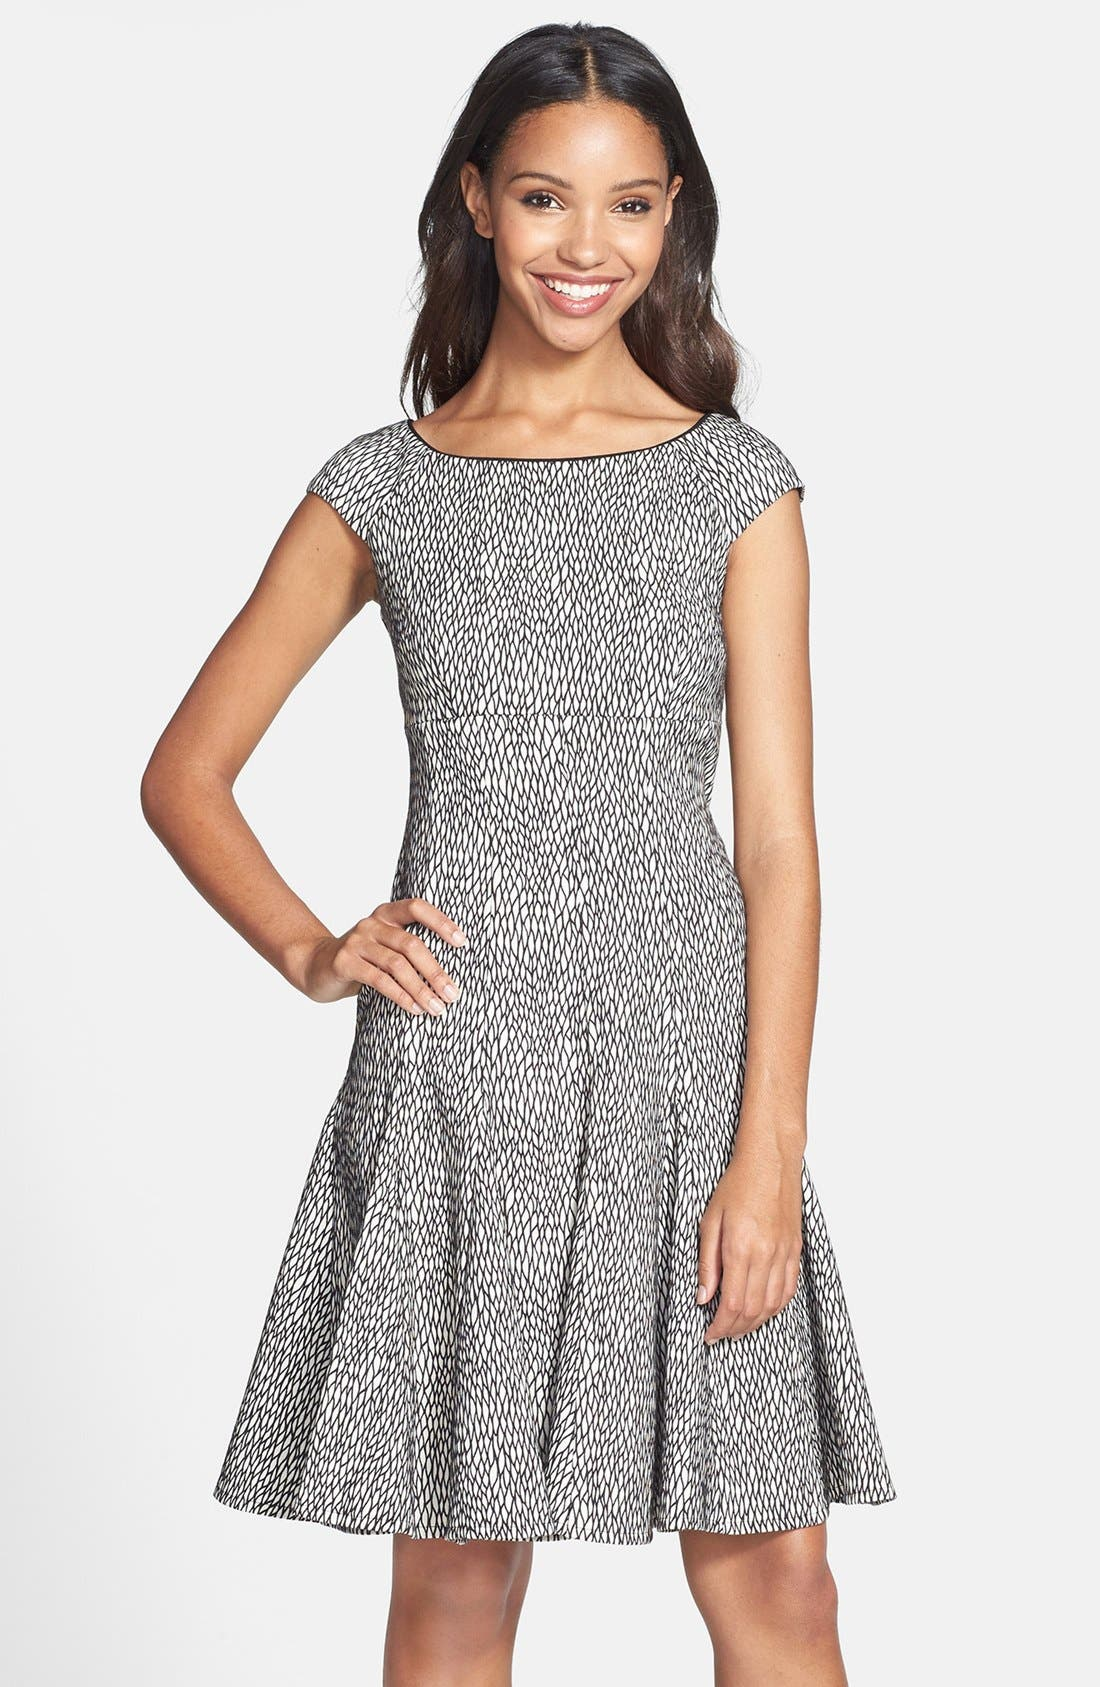 Alternate Image 1 Selected - Gabby Skye Jacquard Fit & Flare Dress